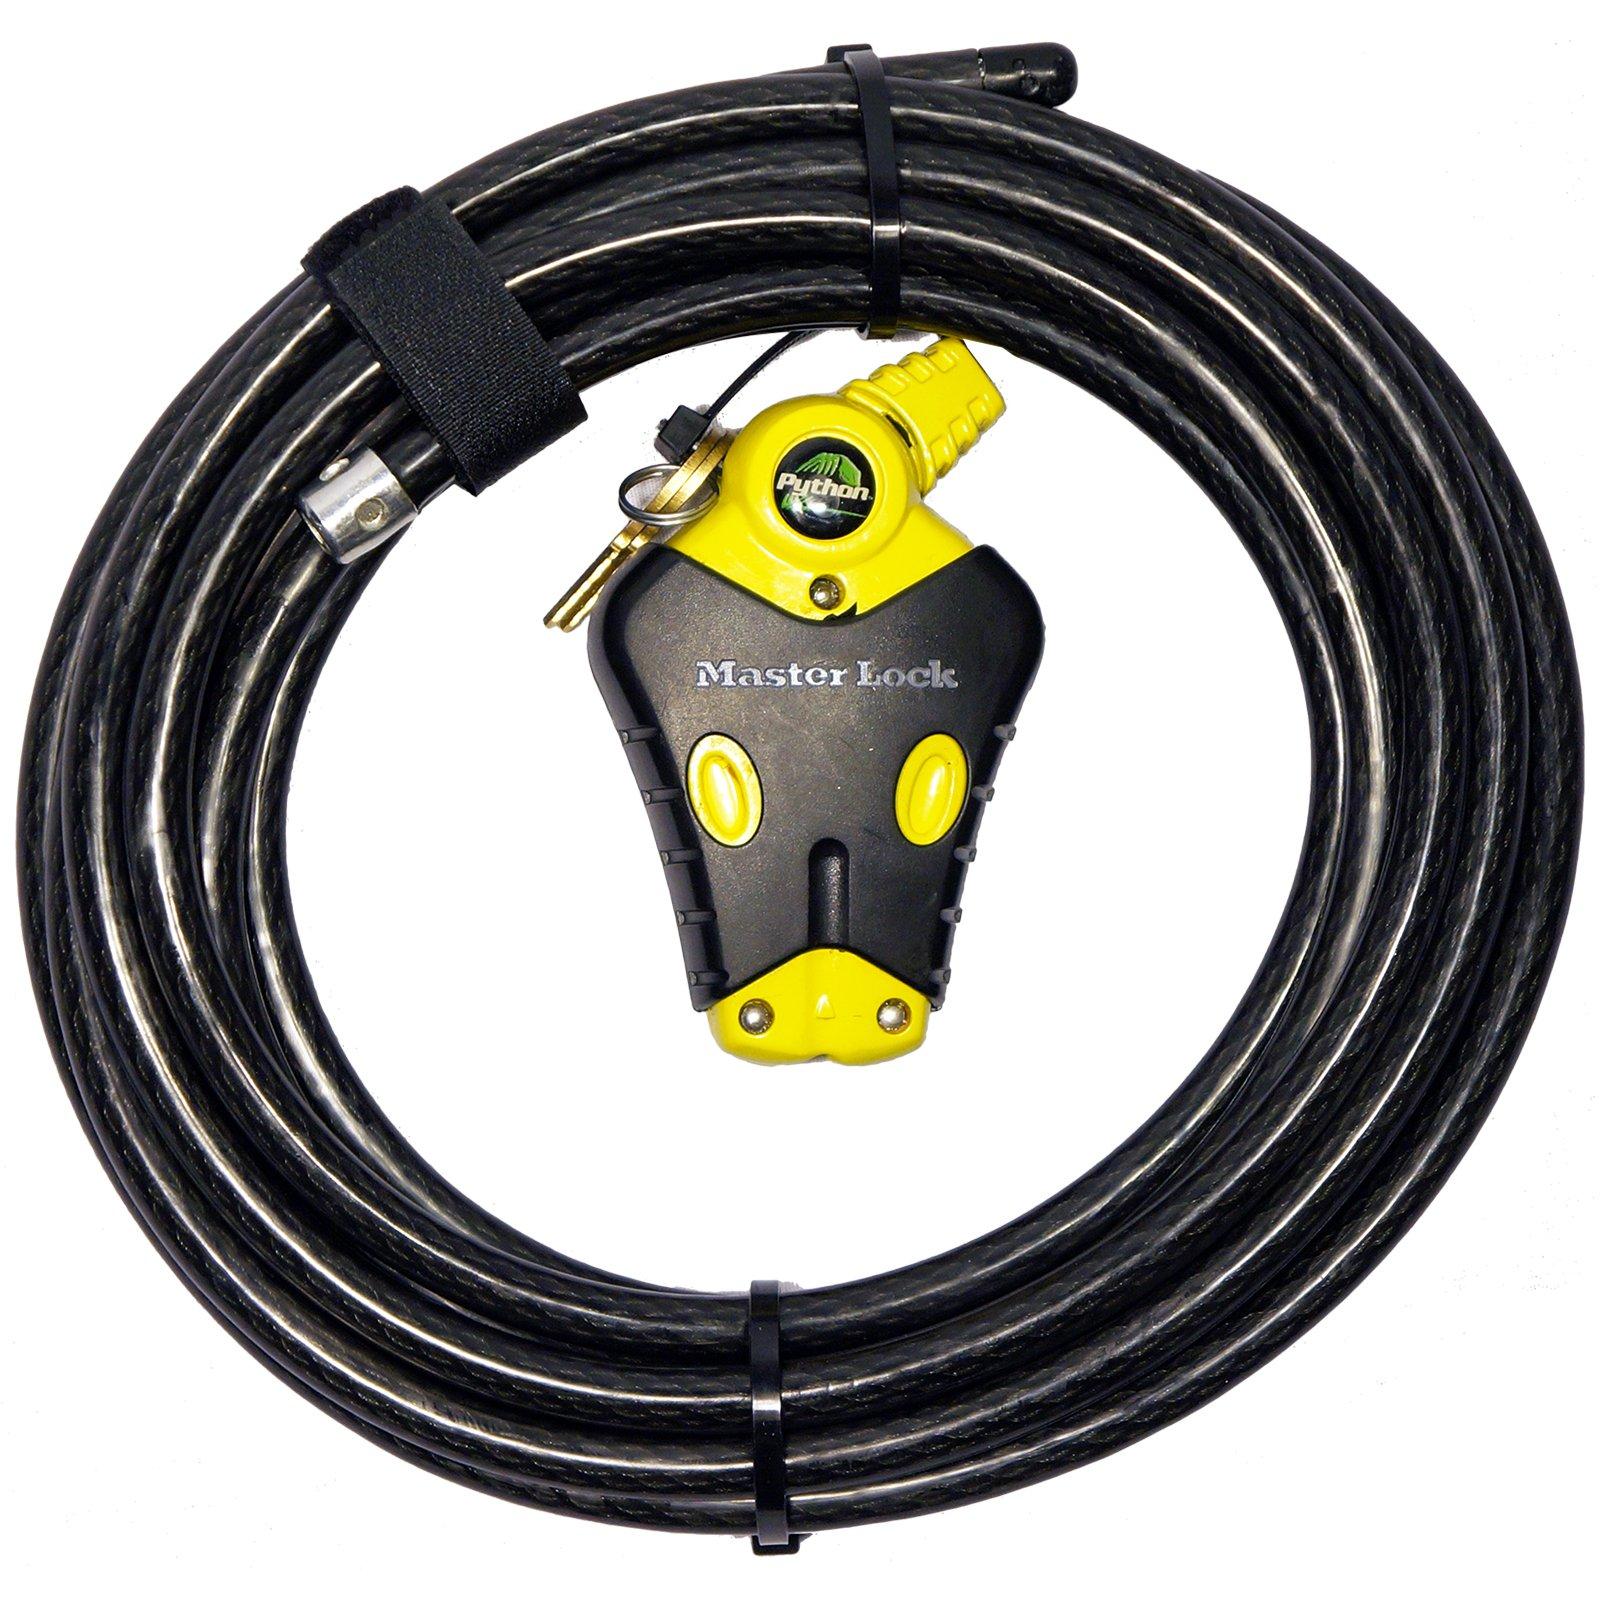 Master Lock 1 Python Adjustable Cable Lock, 8413KACBL-20